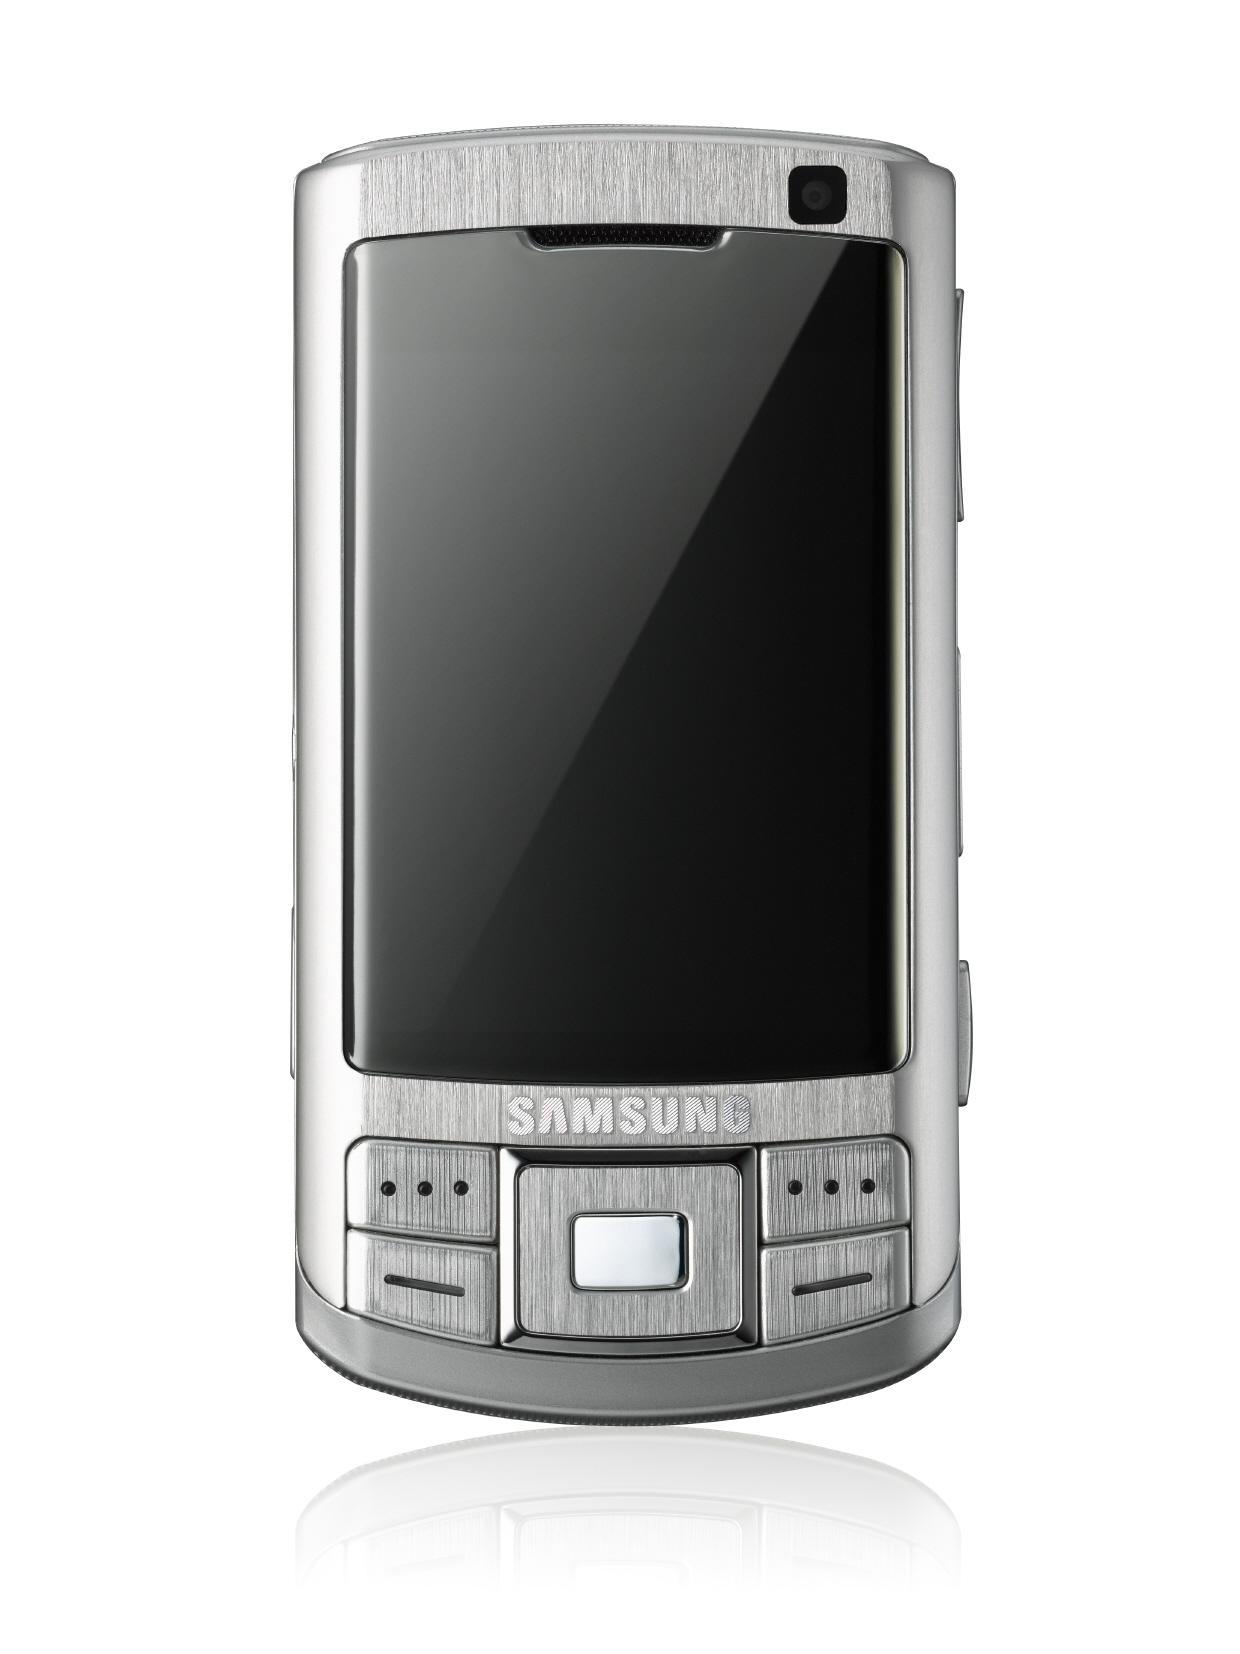 Celulares Baratos Celulares Y Telfonos Mercadolibre